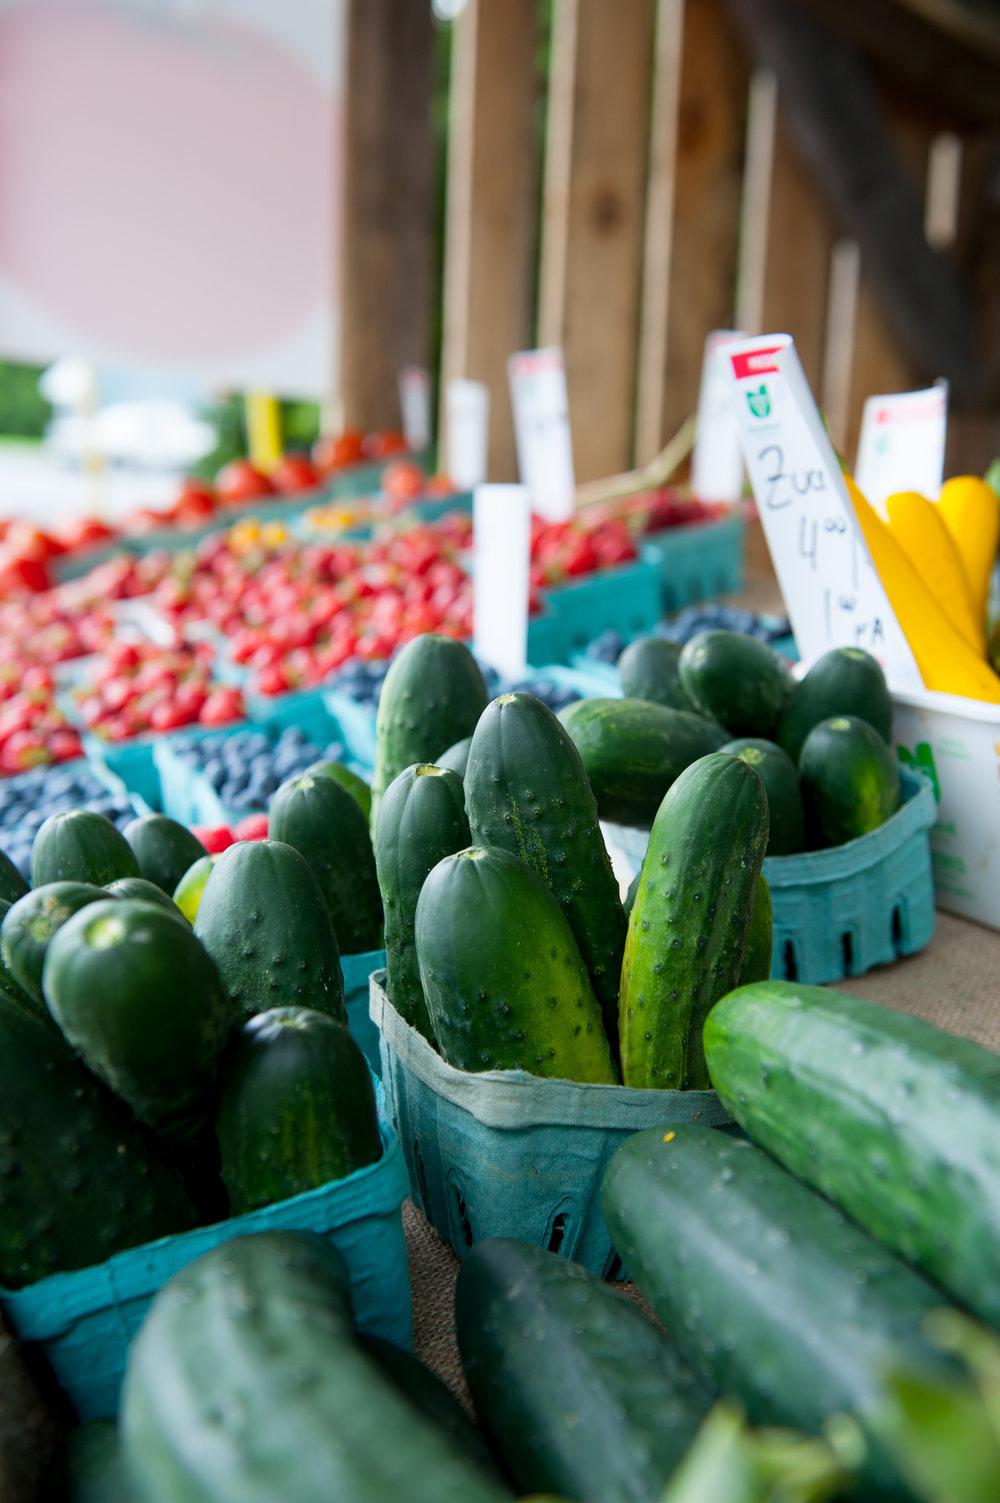 FARMERS' MARKETS -